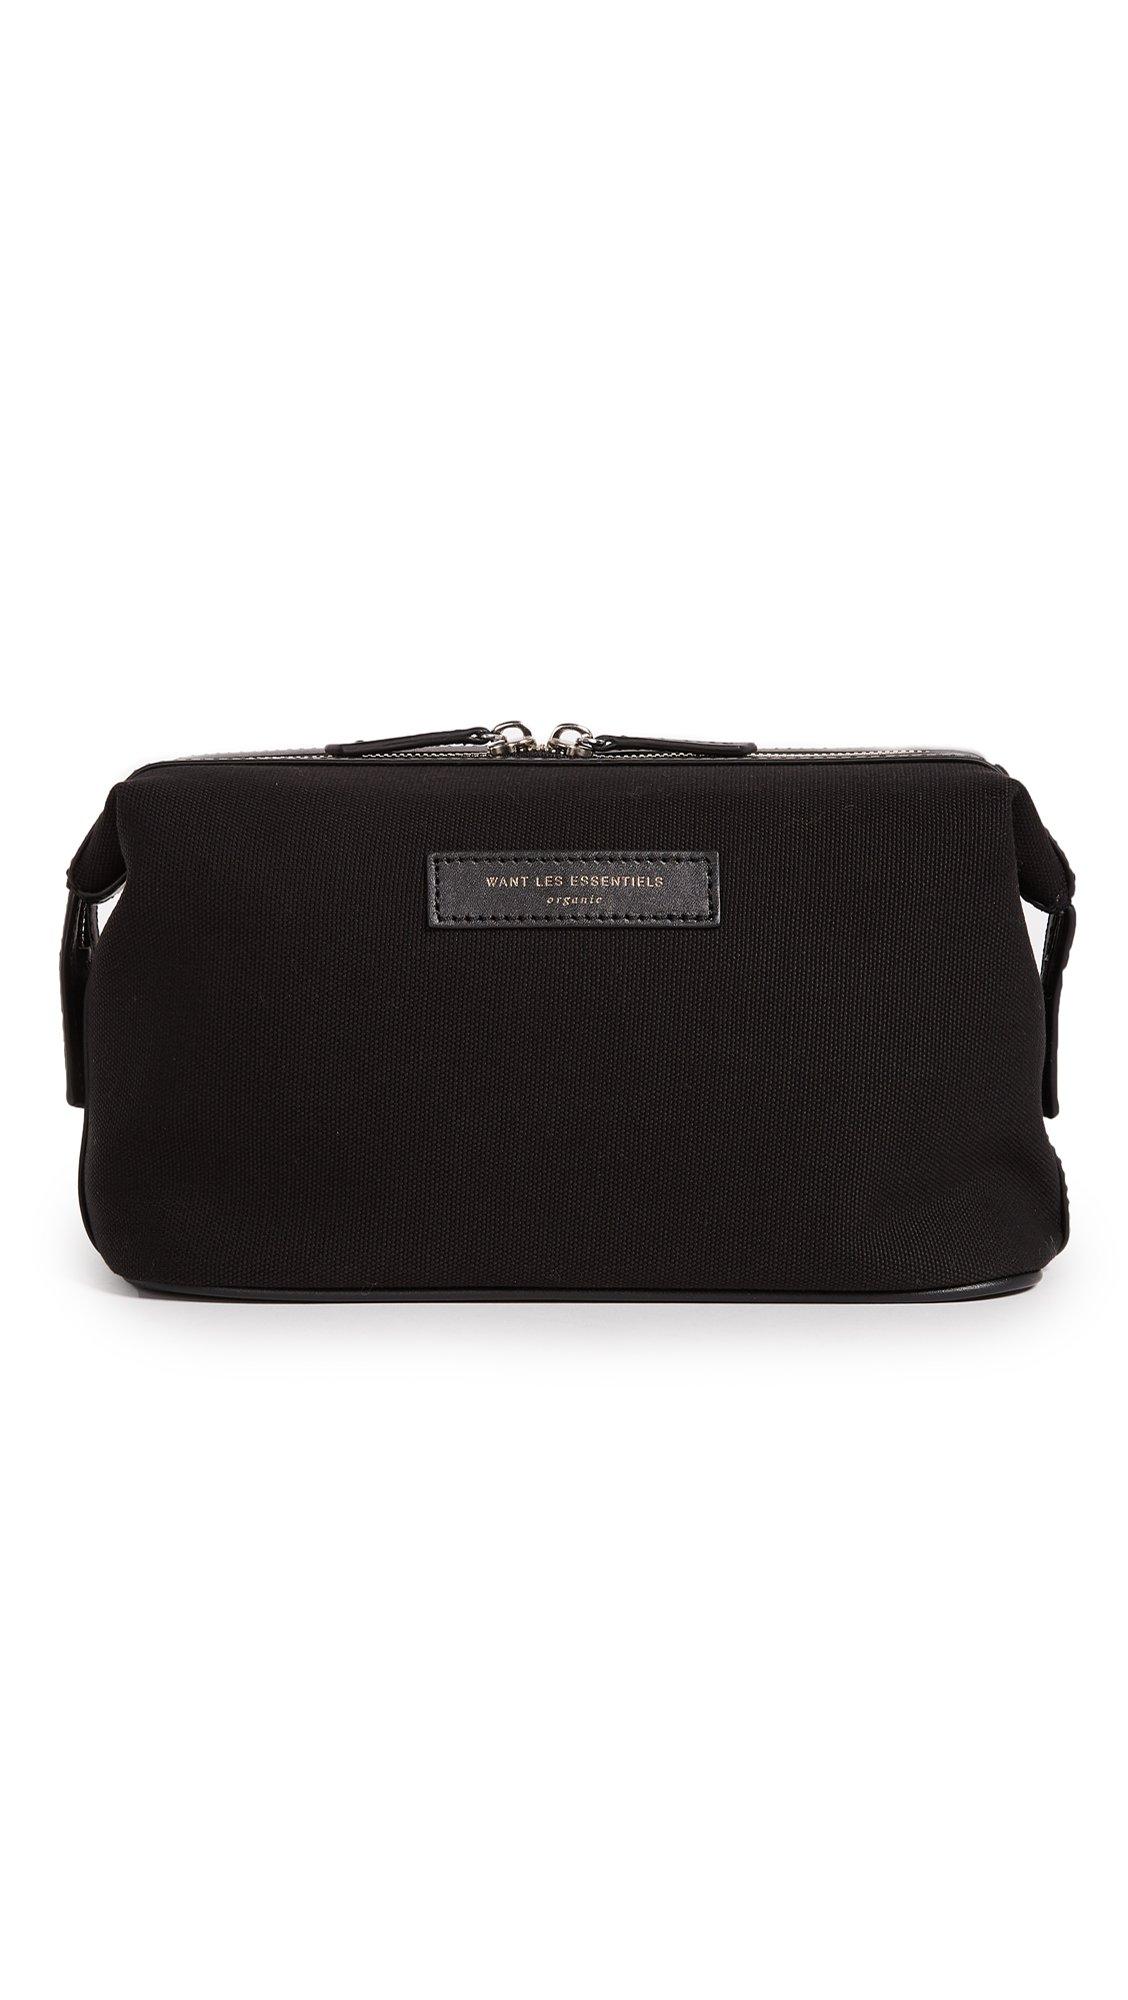 WANT Les Essentiels Men's Kenyatta Dopp Kit, Black/Black, One Size